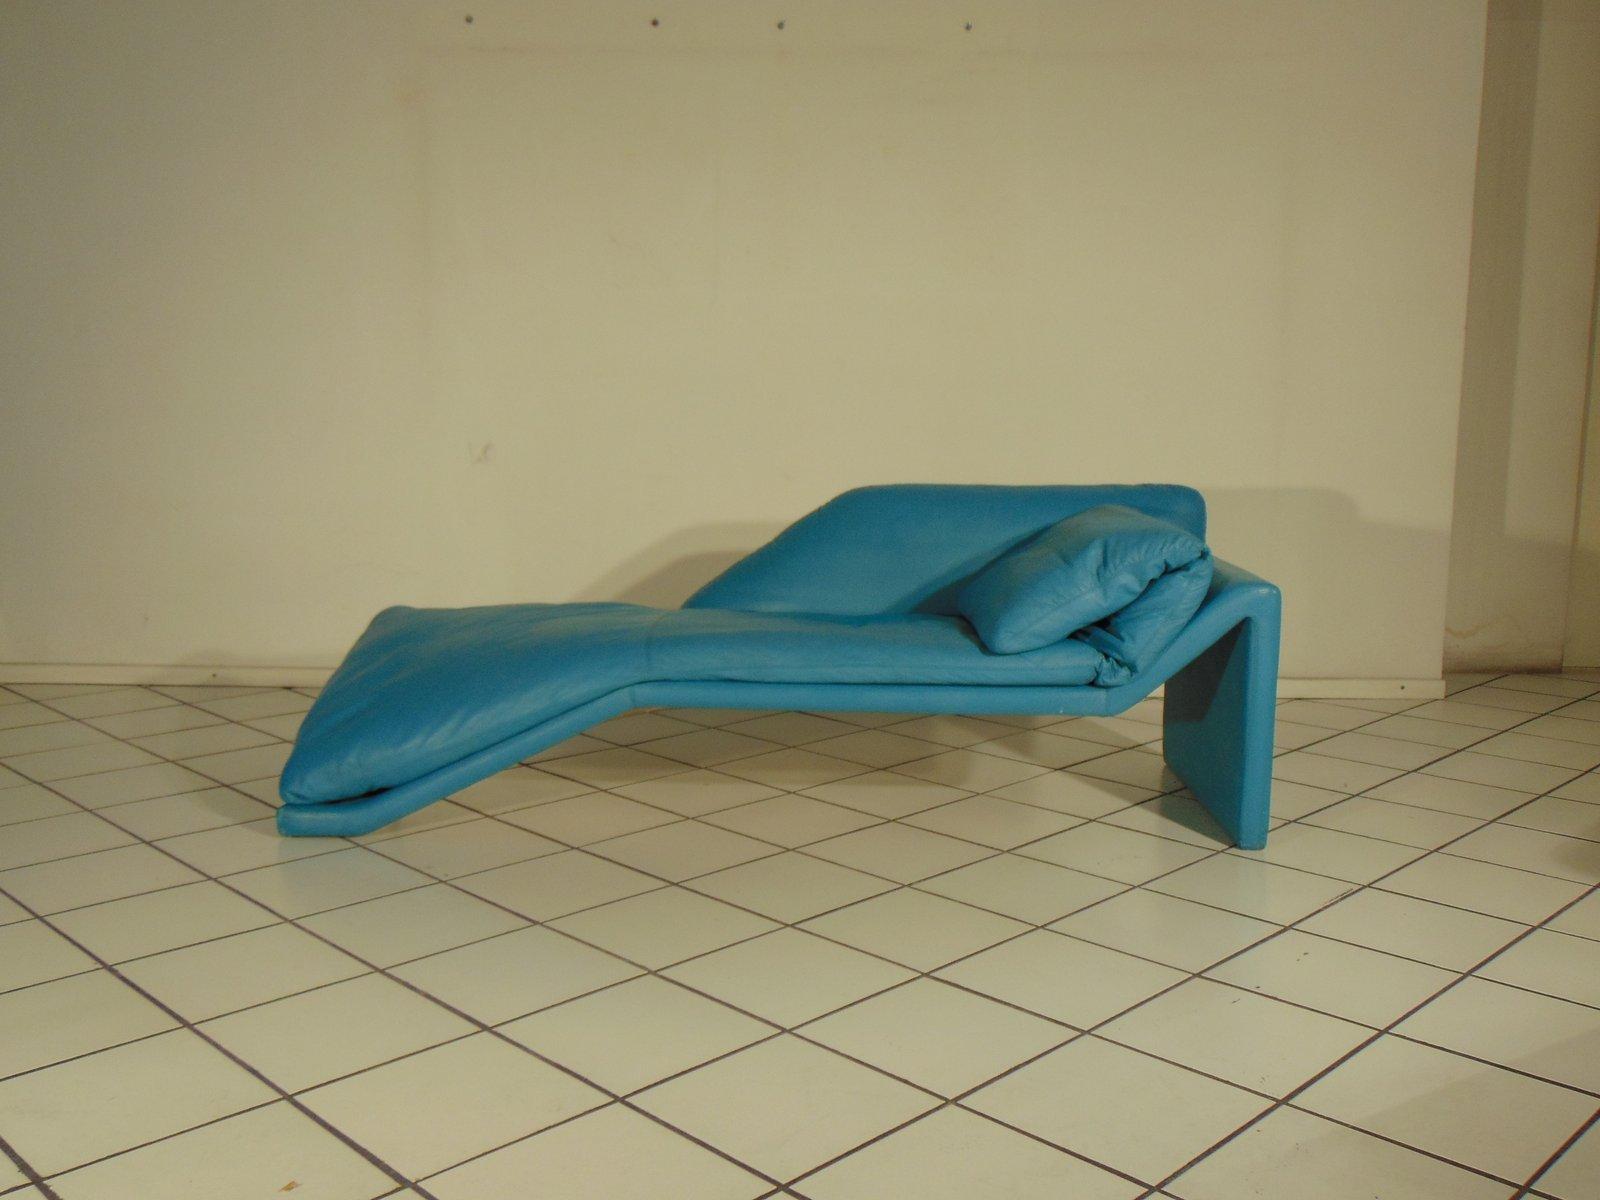 chaise oliviachaiseloungevelvetdream dream velvet product master green olivia hayneedle cfm lounge